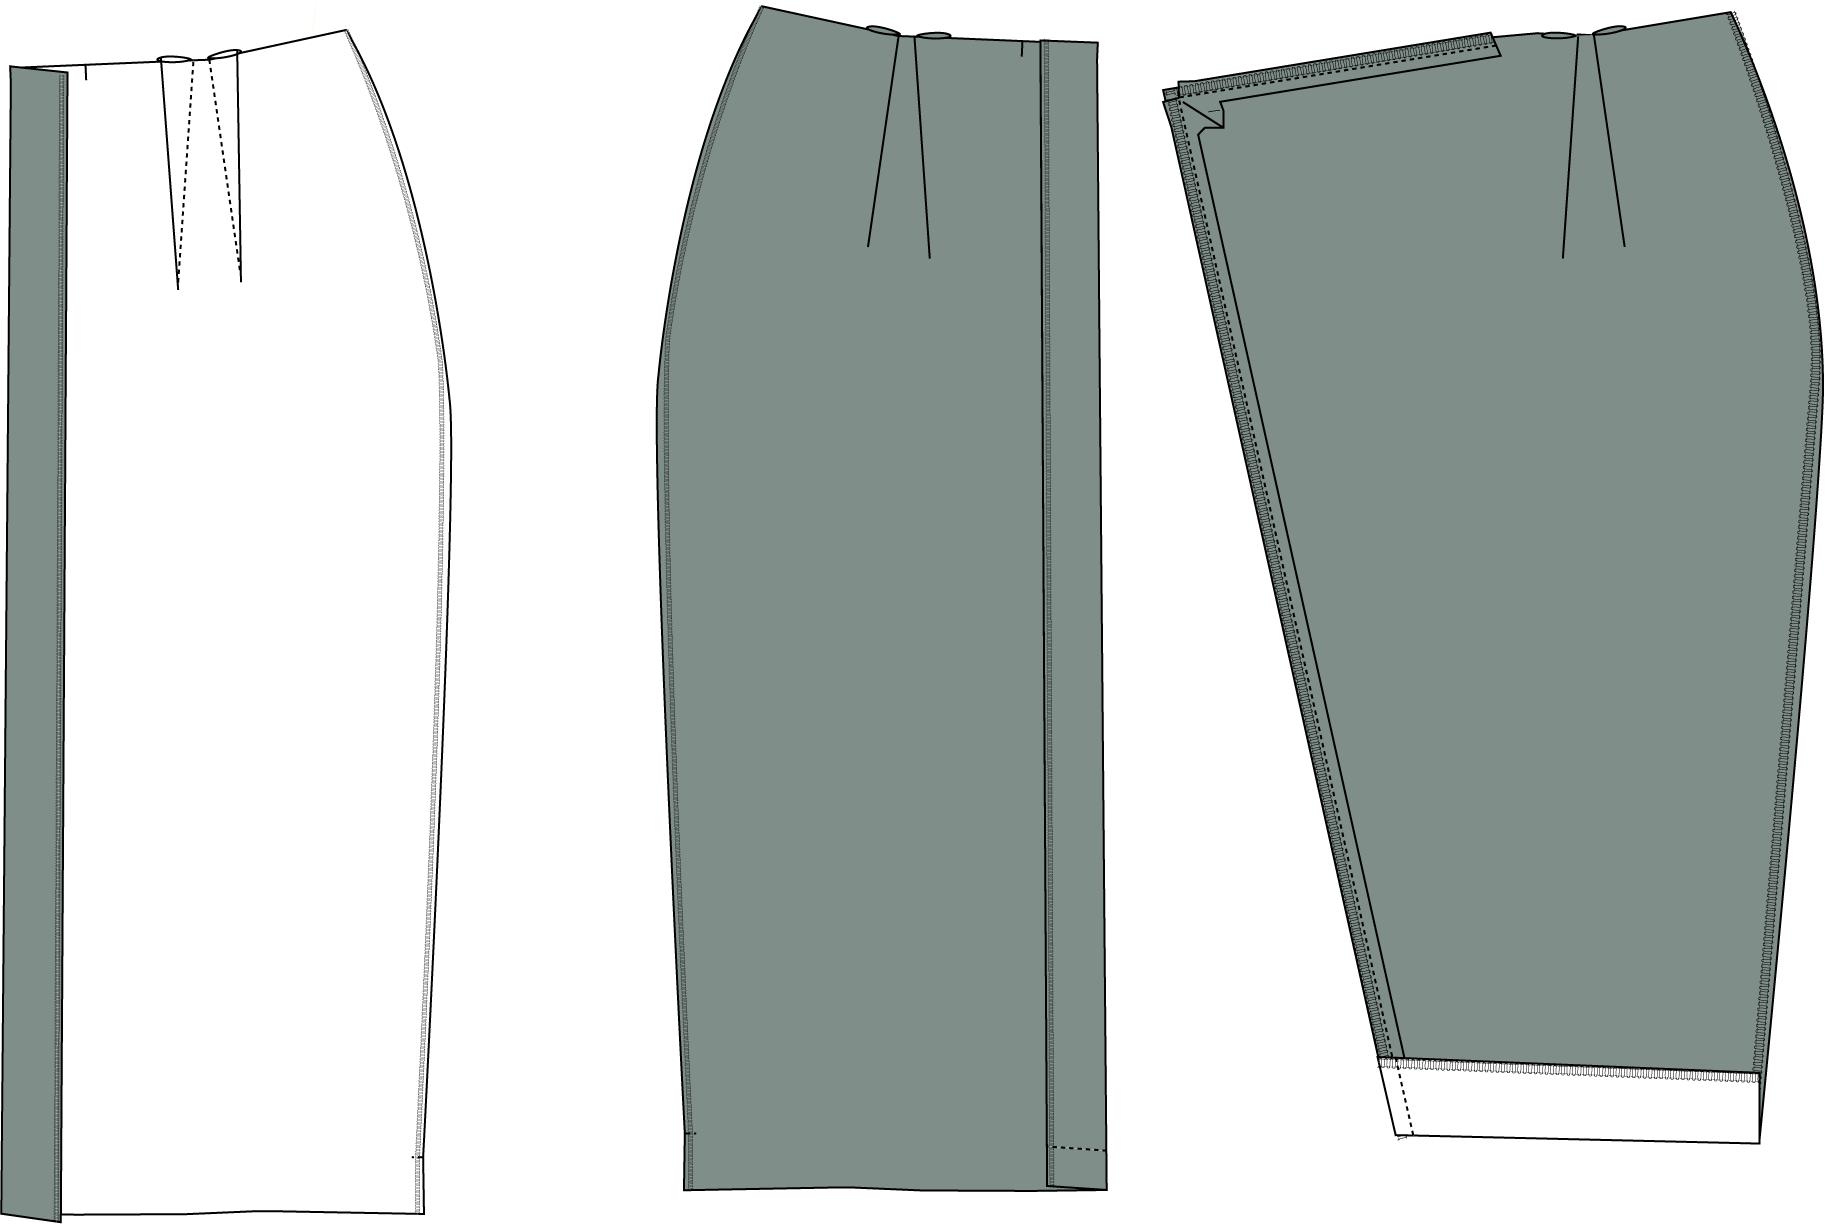 546a4-v2-37.png